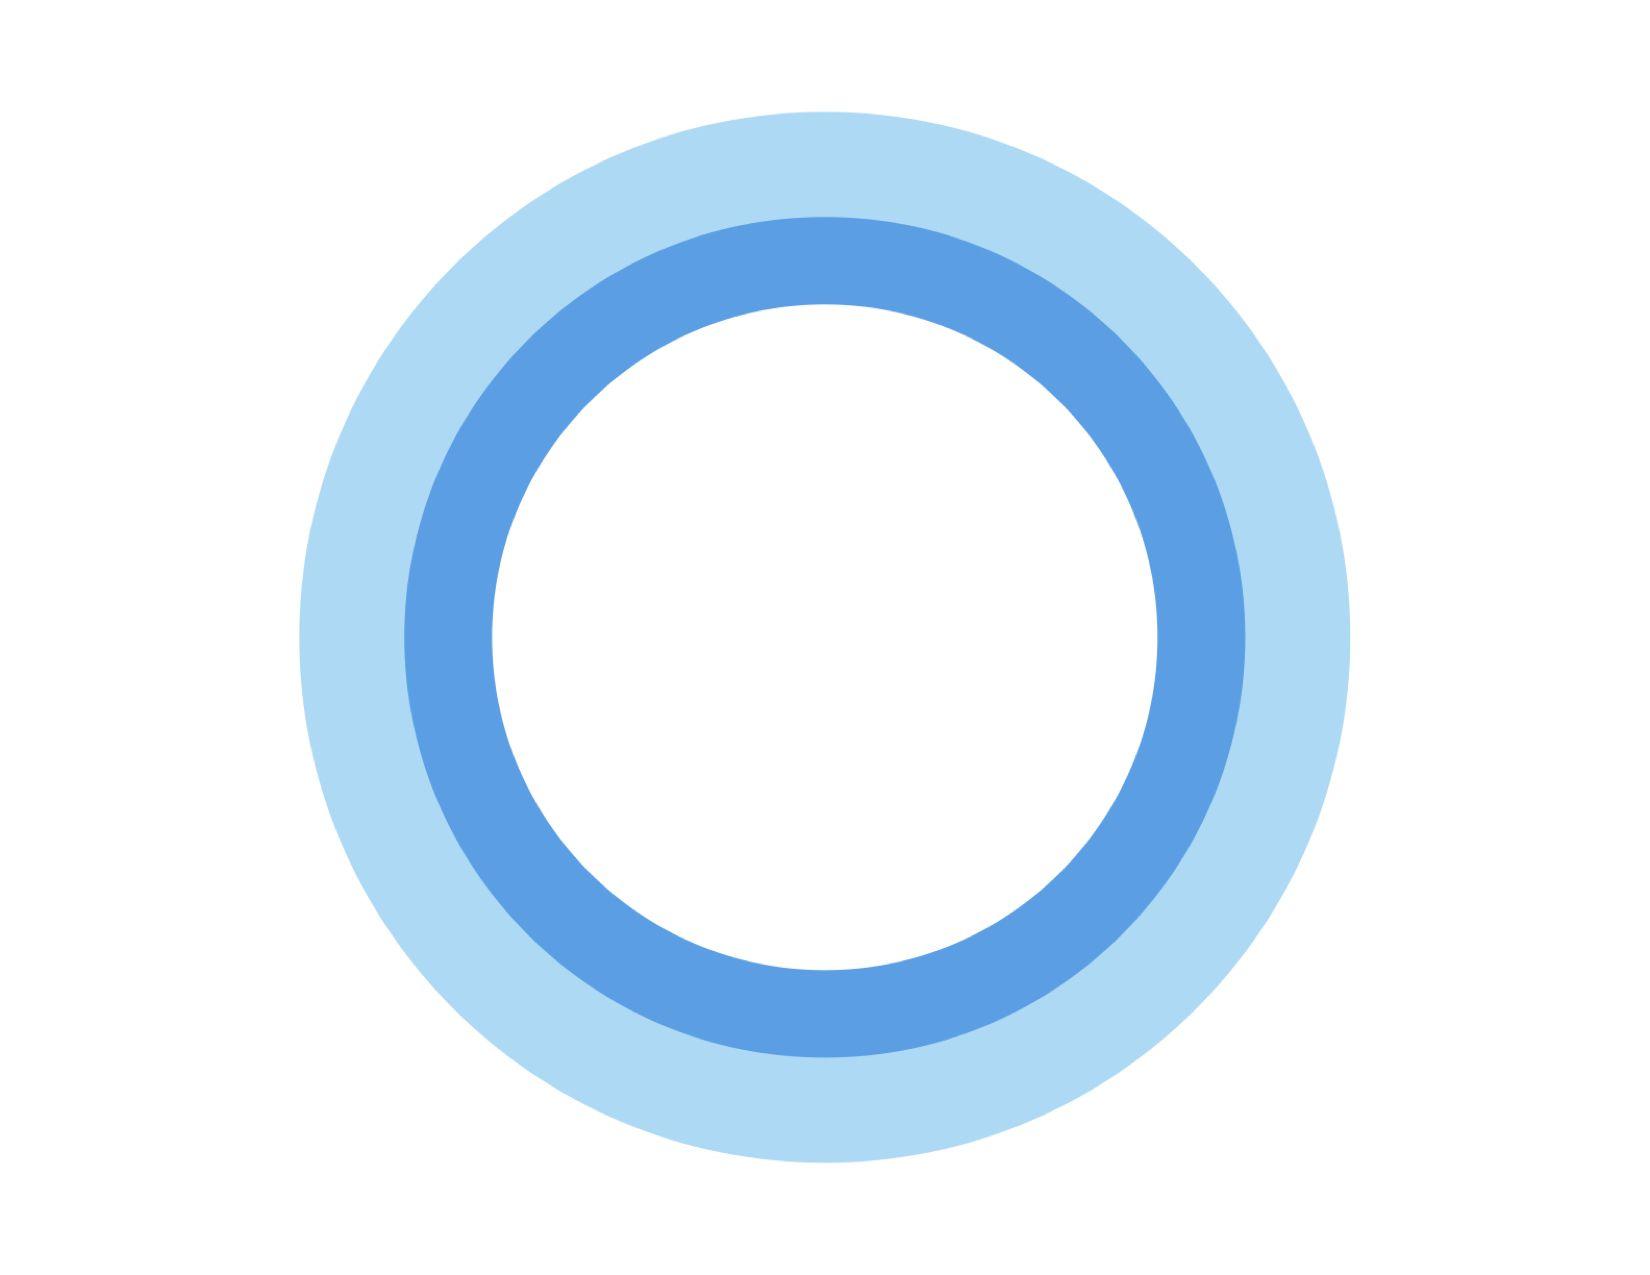 Cortana Not Working? 8 Ways to Fix It Fast.